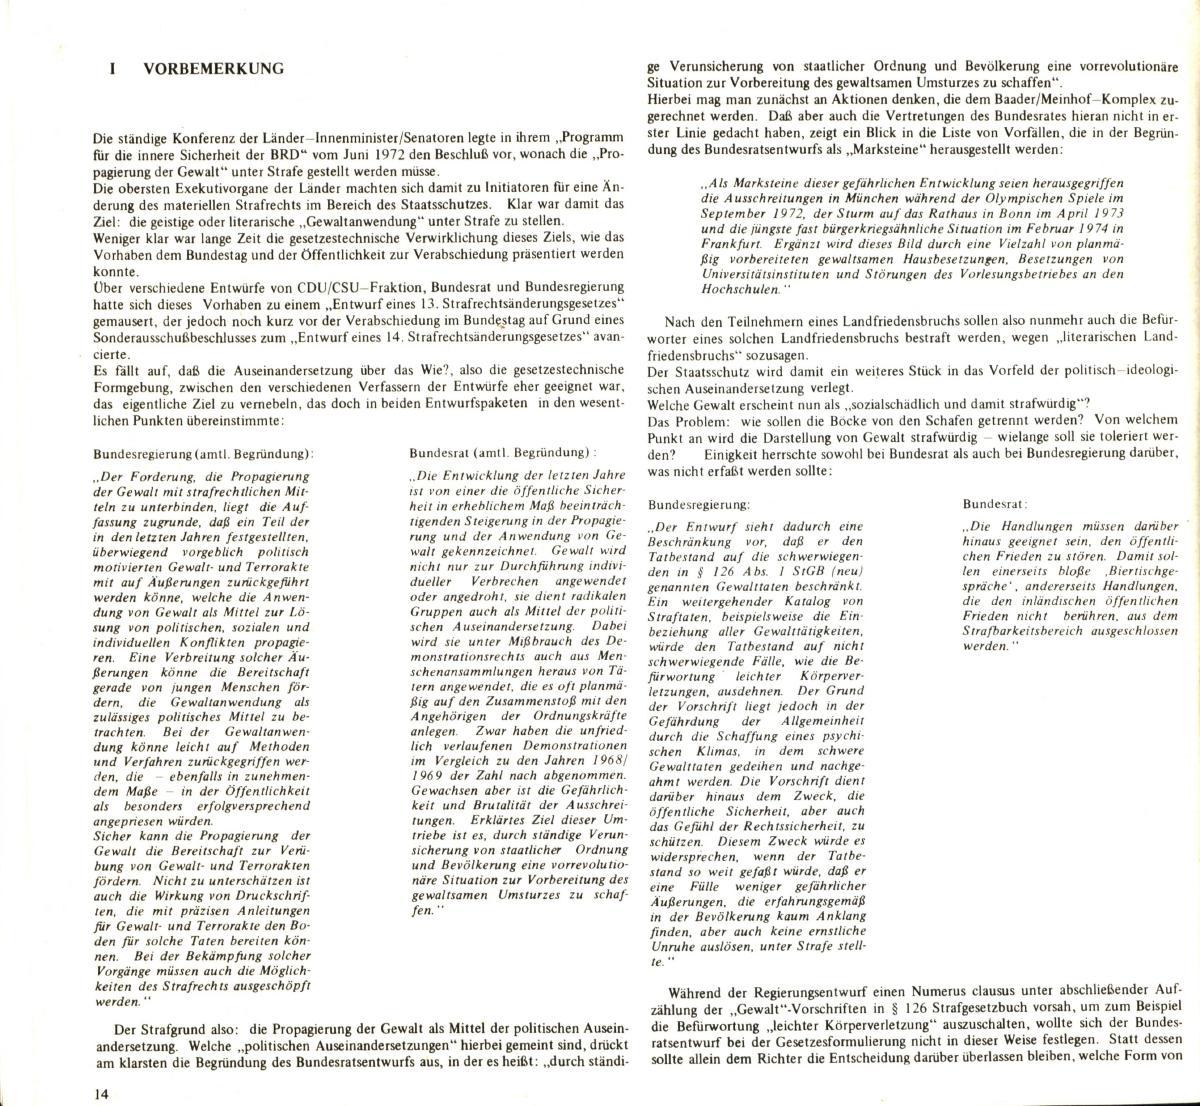 REP_VLB_1976_Die_Zensurgesetze_15